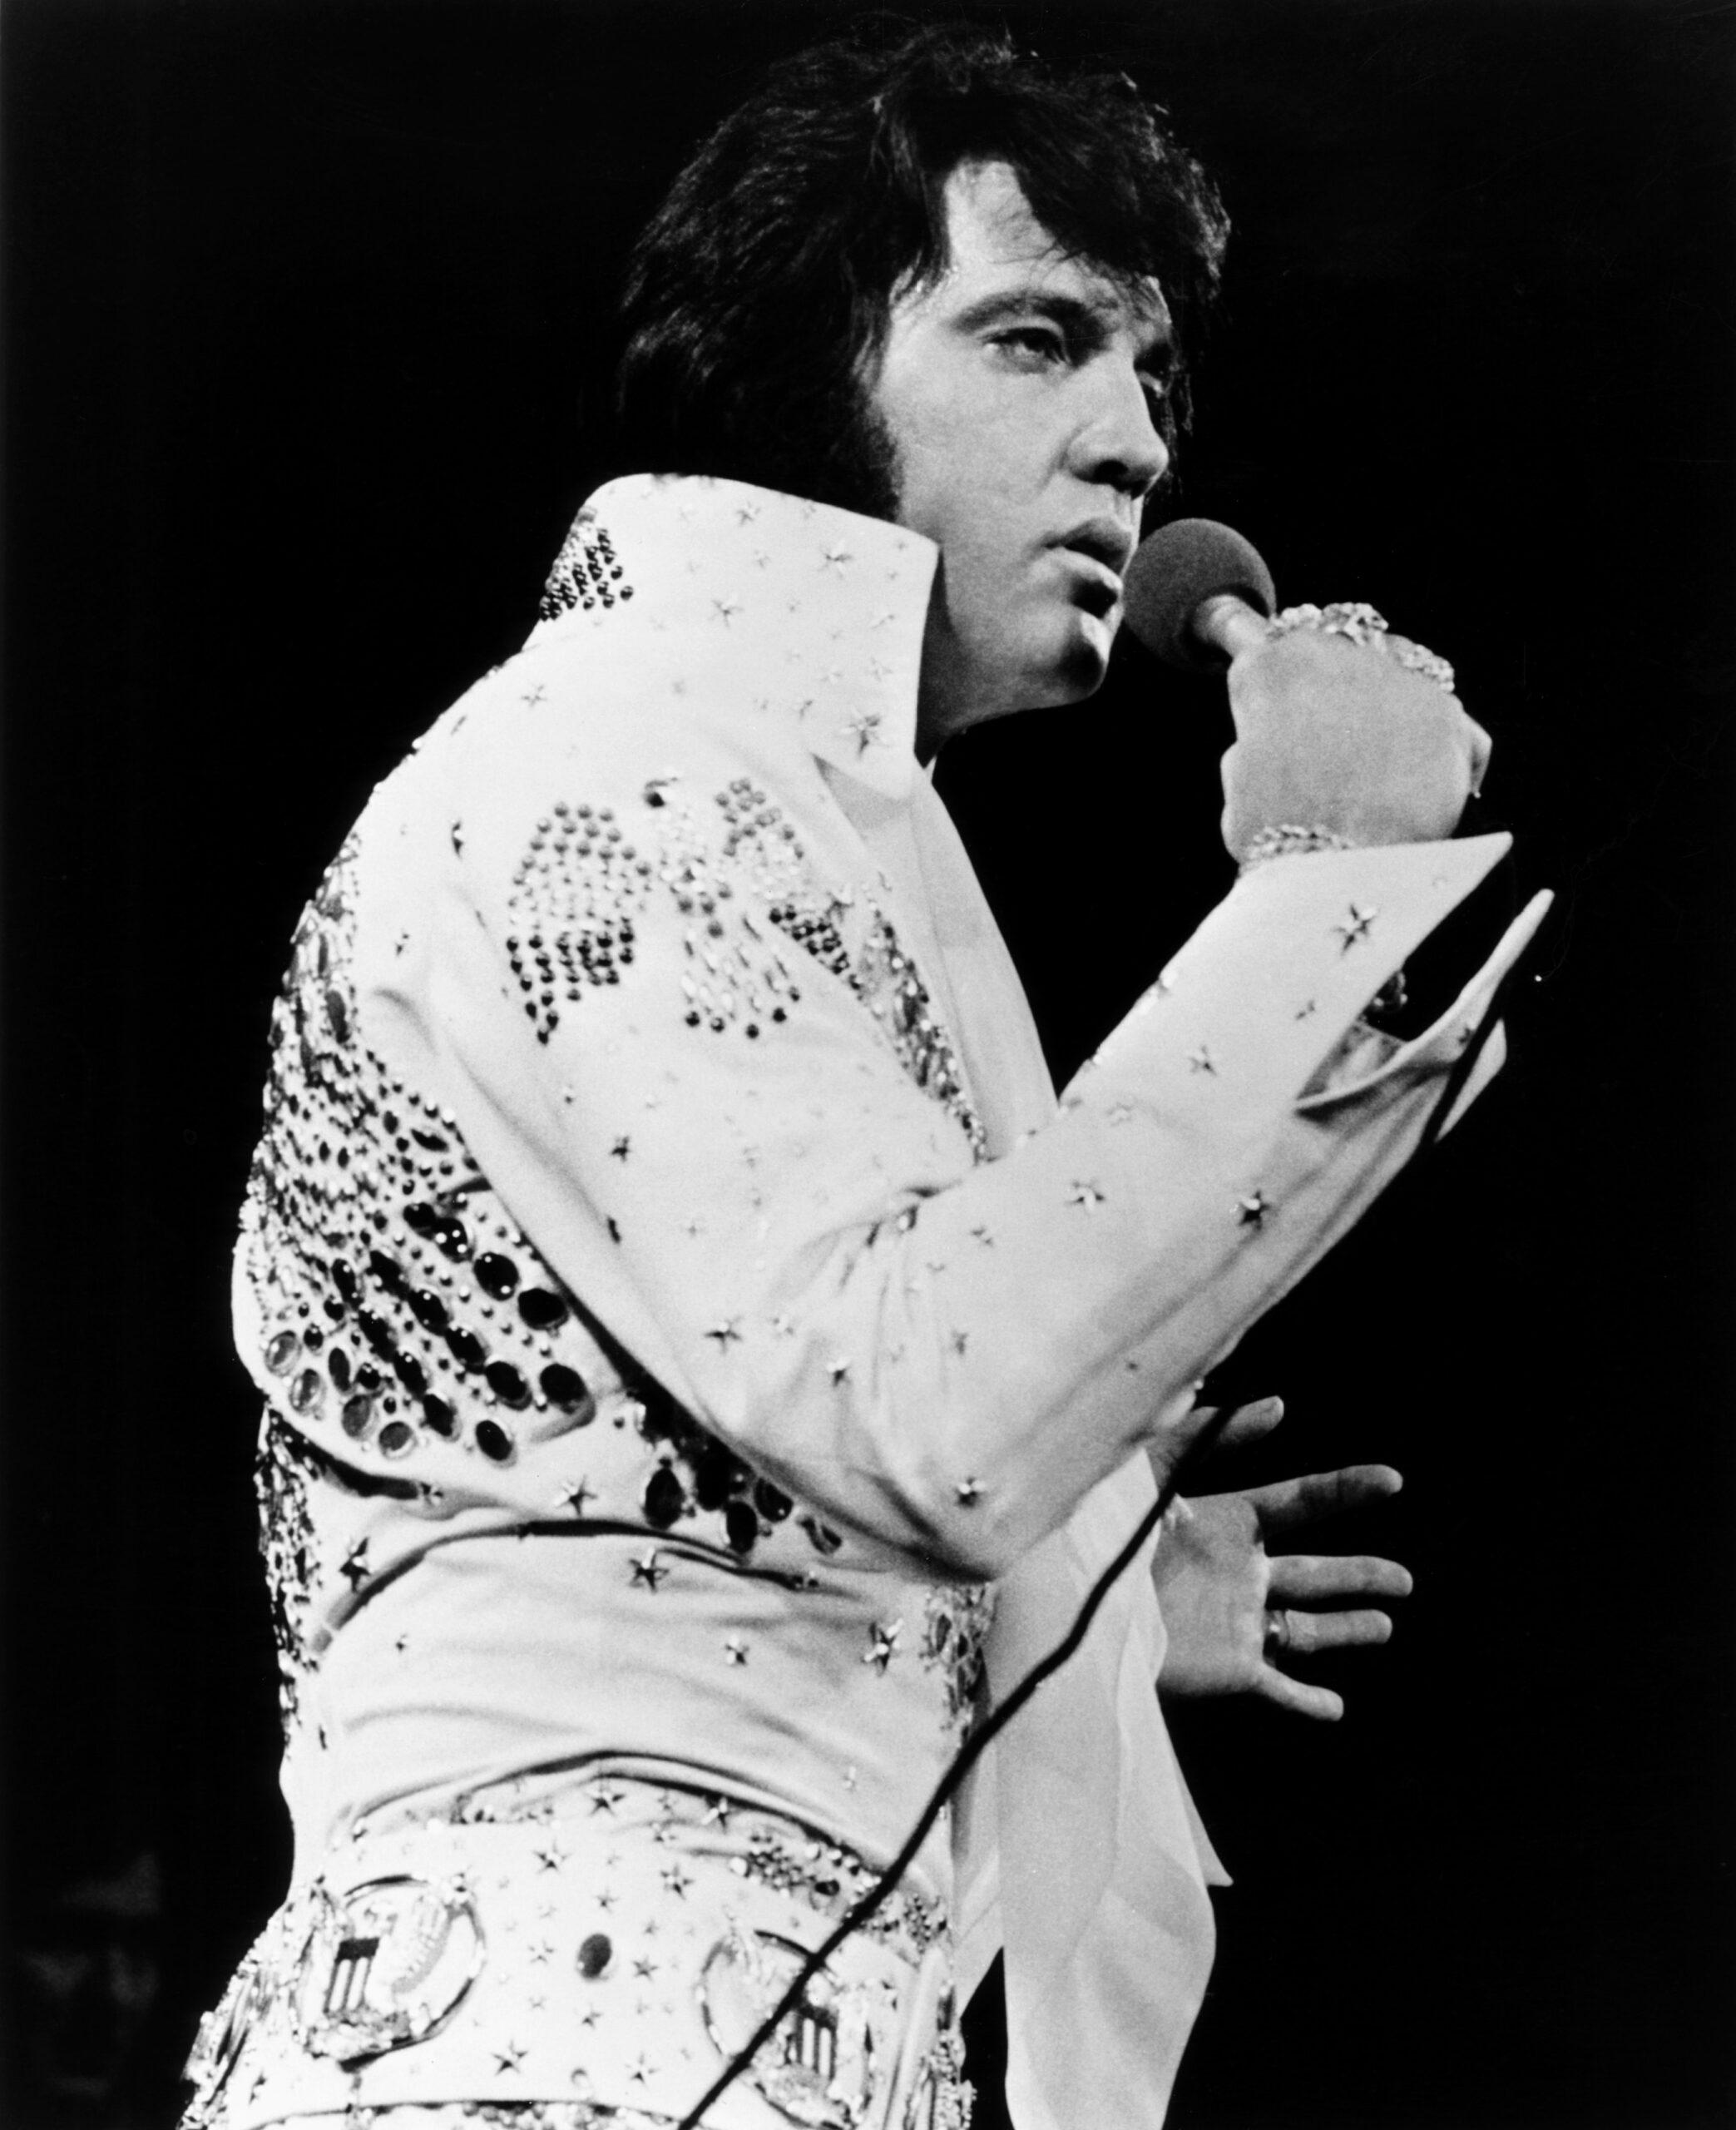 Former Girlfriend Of Elvis Presley States 'He Knew He Would Die At 42'